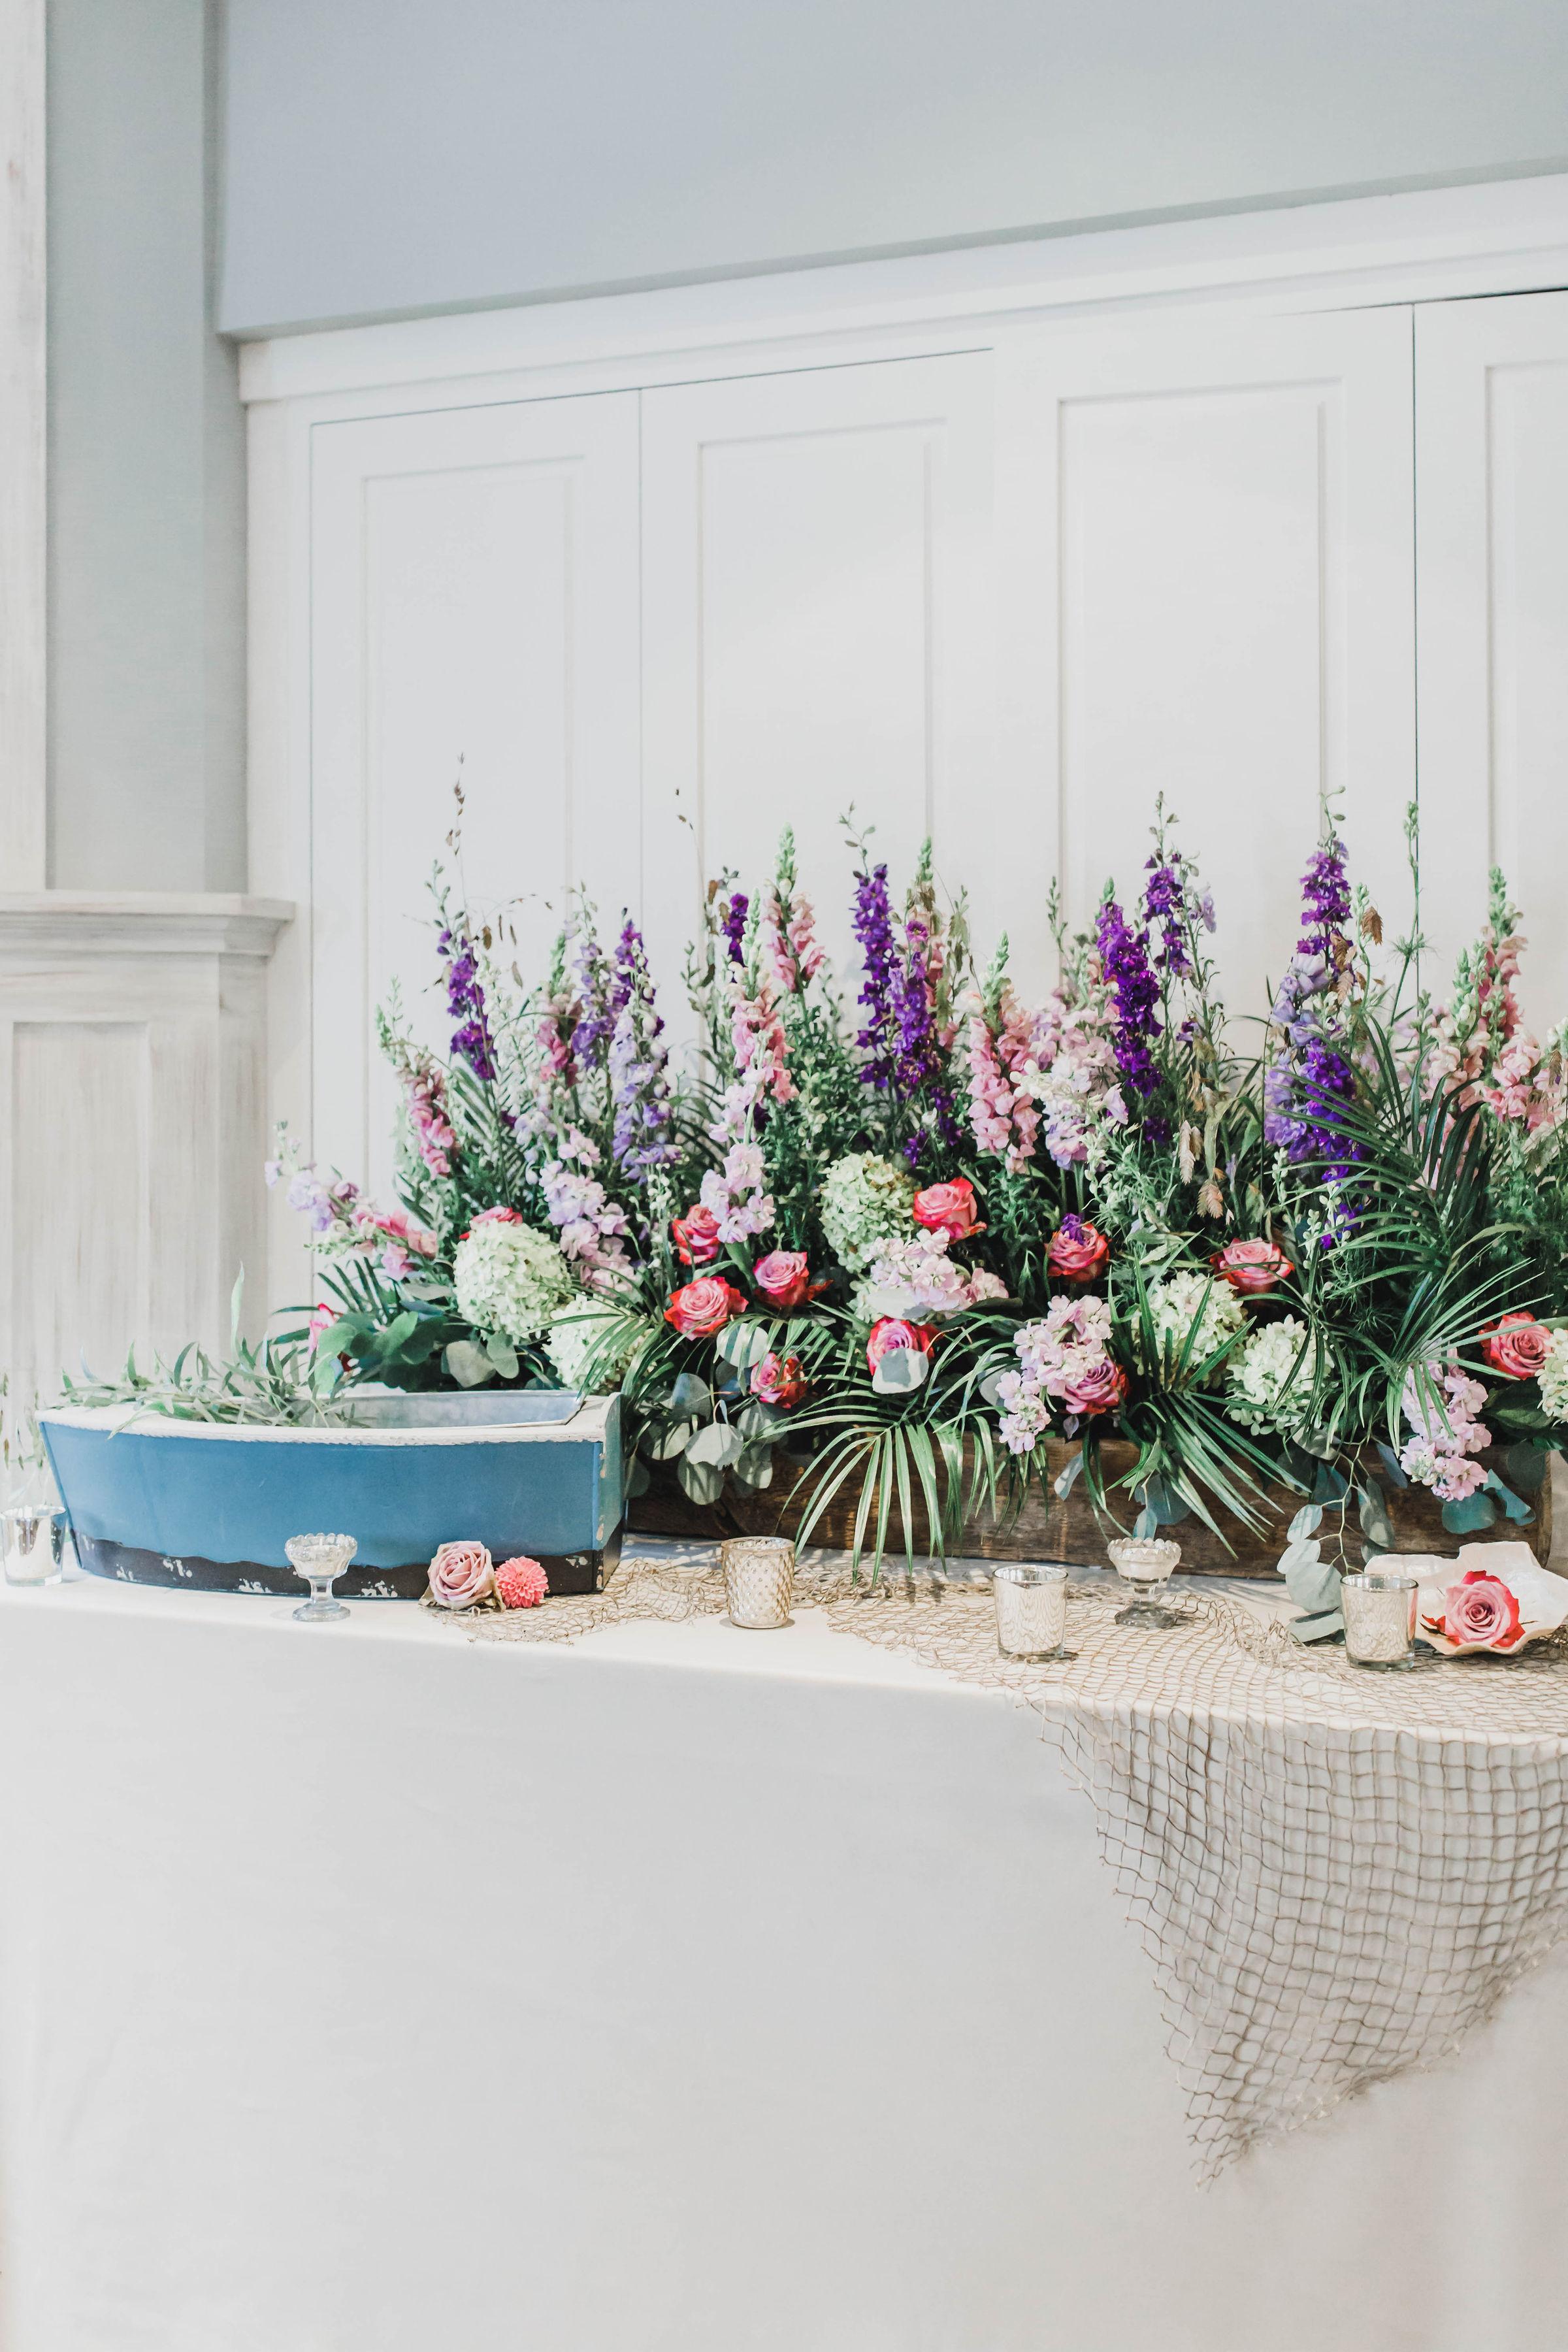 NJ Wedding, Seating Chart, Seating Assignments, Wedding Inspo, A Garden Party, Beach Wedding, Icona Avalon Wedding, NJ Bride